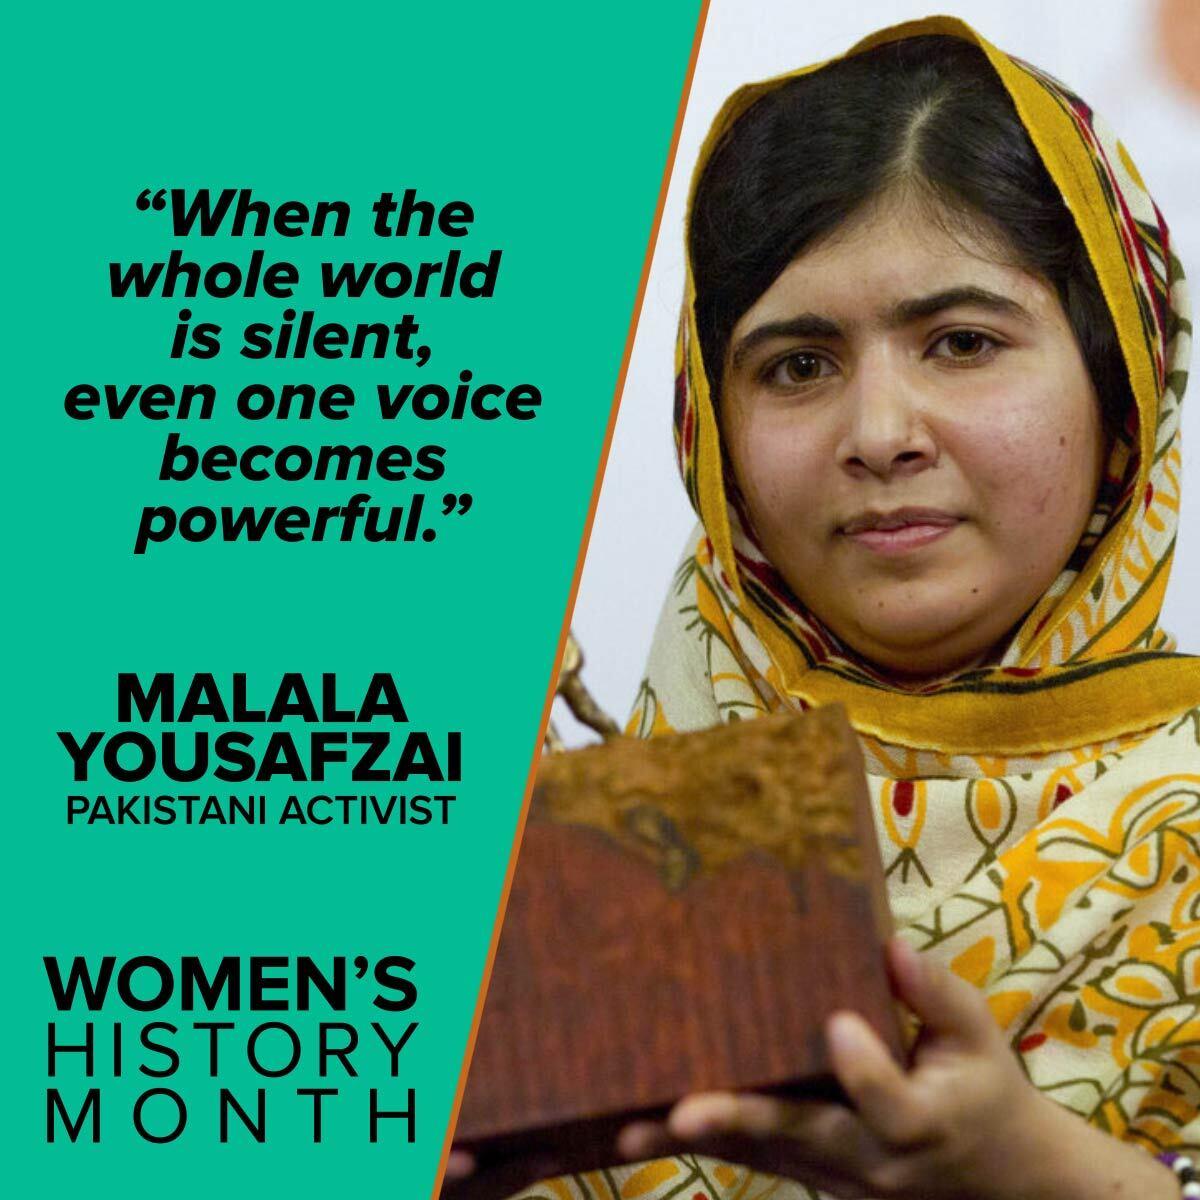 Women's History Month_Malala Yousafzai).jpg